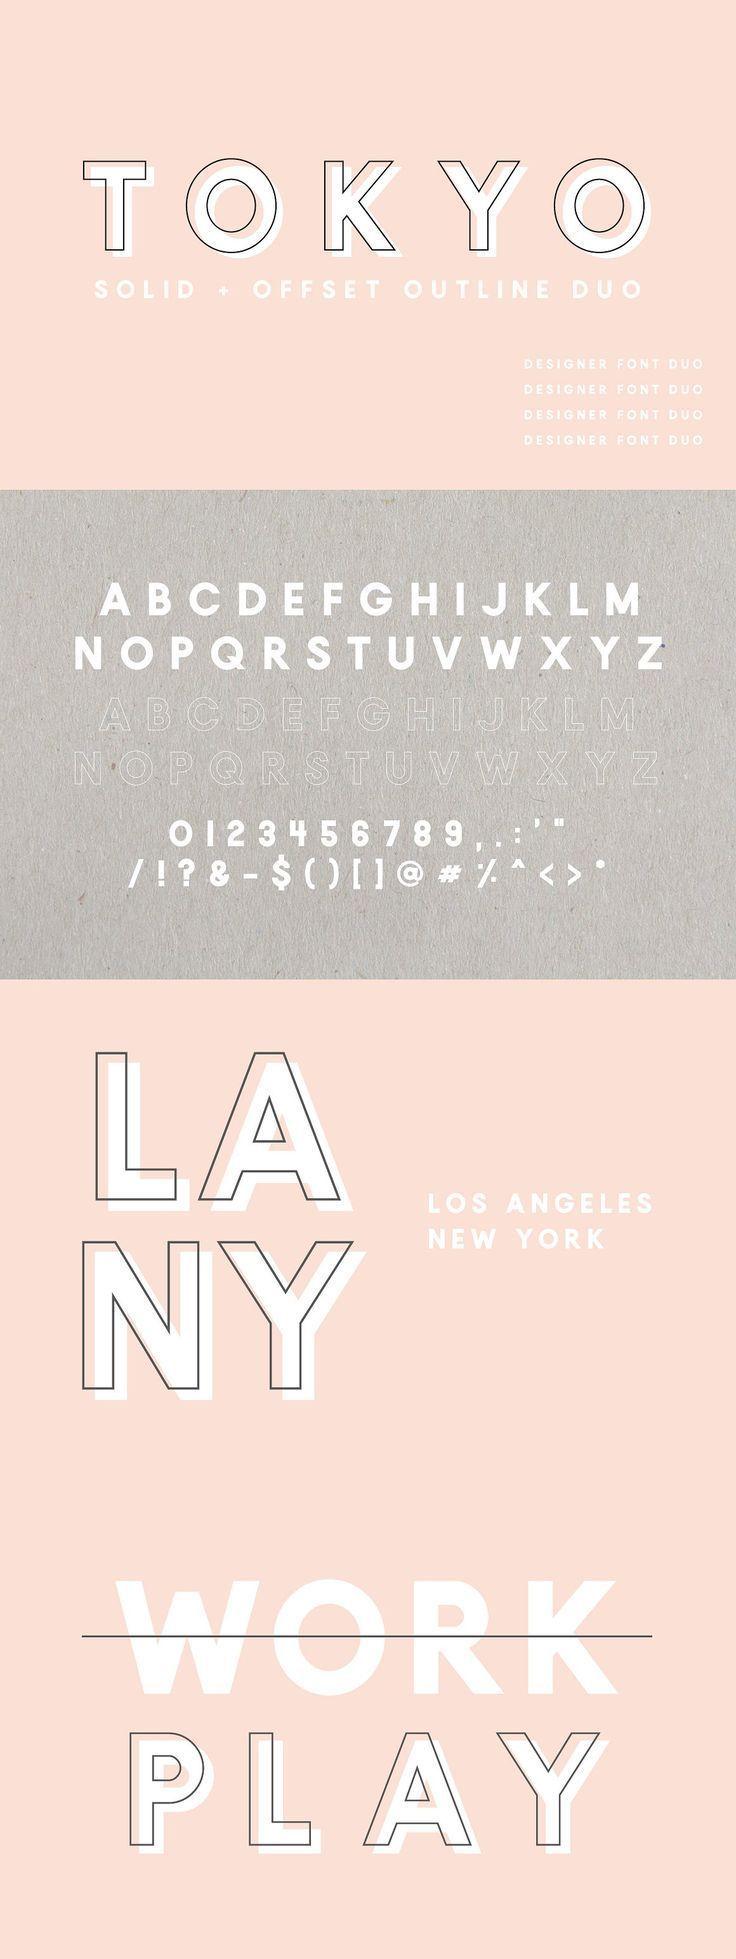 modern sans serif resume font juve cenitdelacabrera co